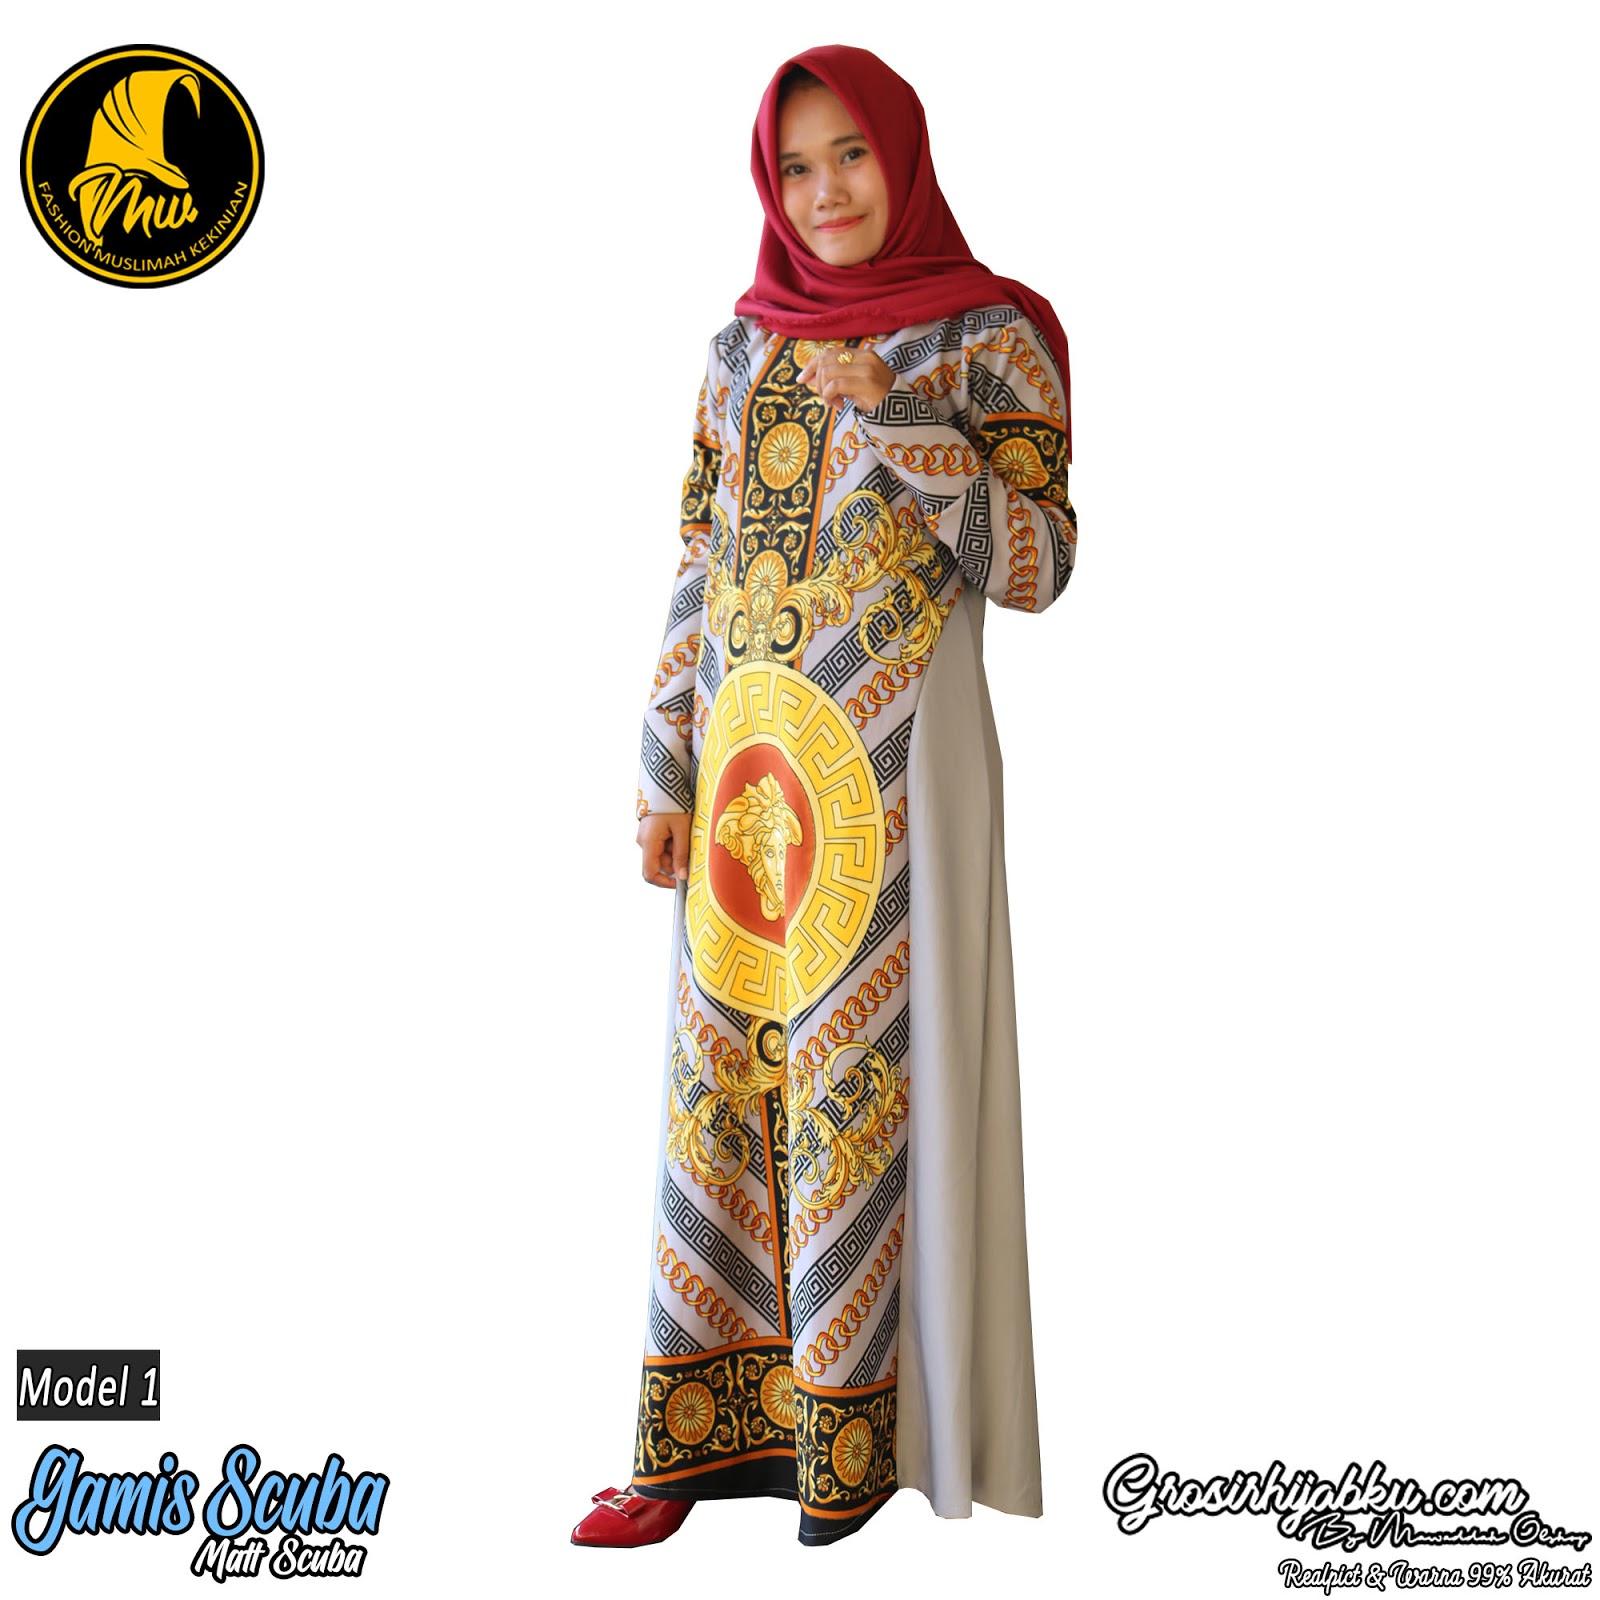 Jilbab Syari Murah Gamis Terbaru Rok Panjang Dan Celana Kulot Mayung Scuba Bahan Tebal Nyaman Di Pakai Variasi Saku Kanan